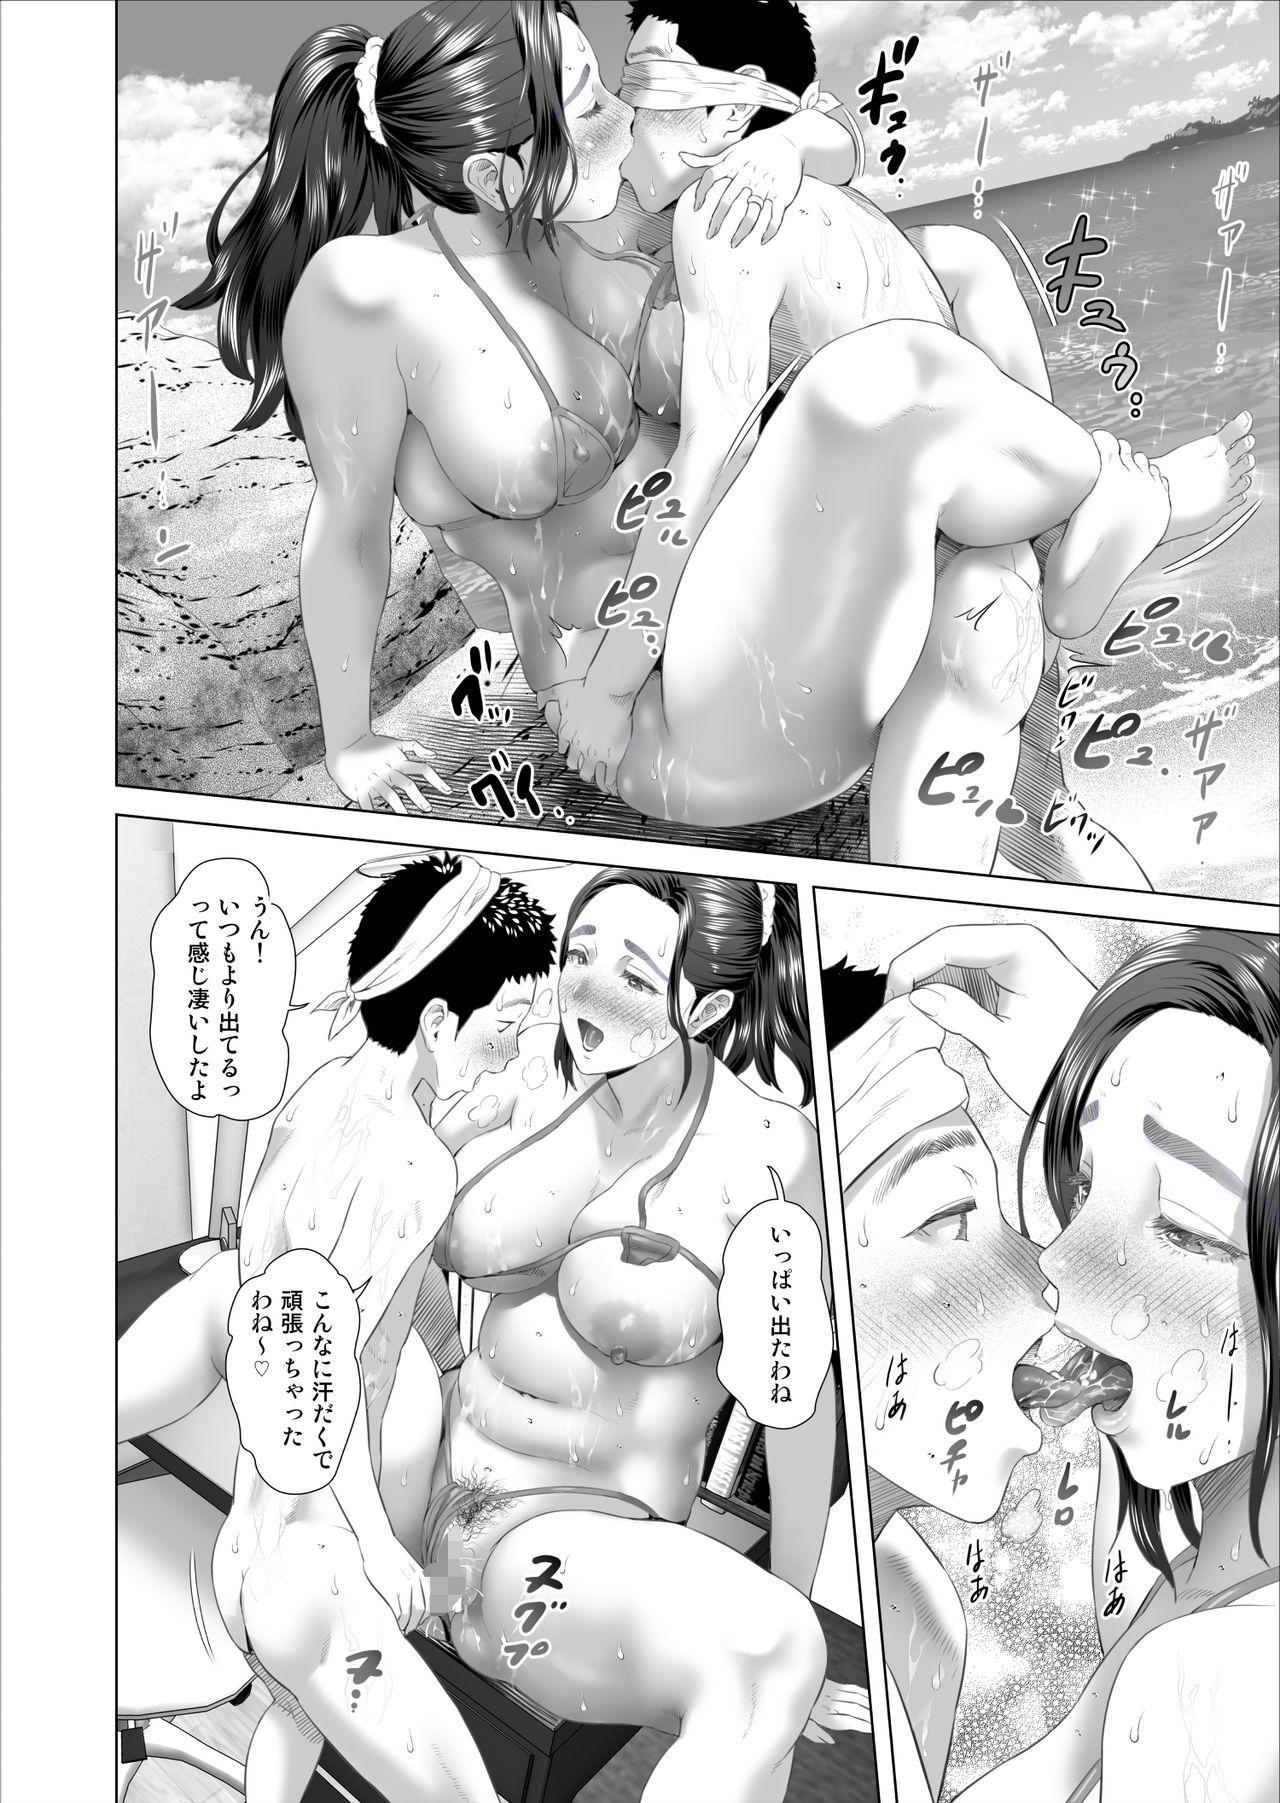 Kinjo Yuuwaku Musuko o Yobai ni Sasou Haha Hen | Neighborhood Seduction Mother Lures Son for a Night Visit! 197